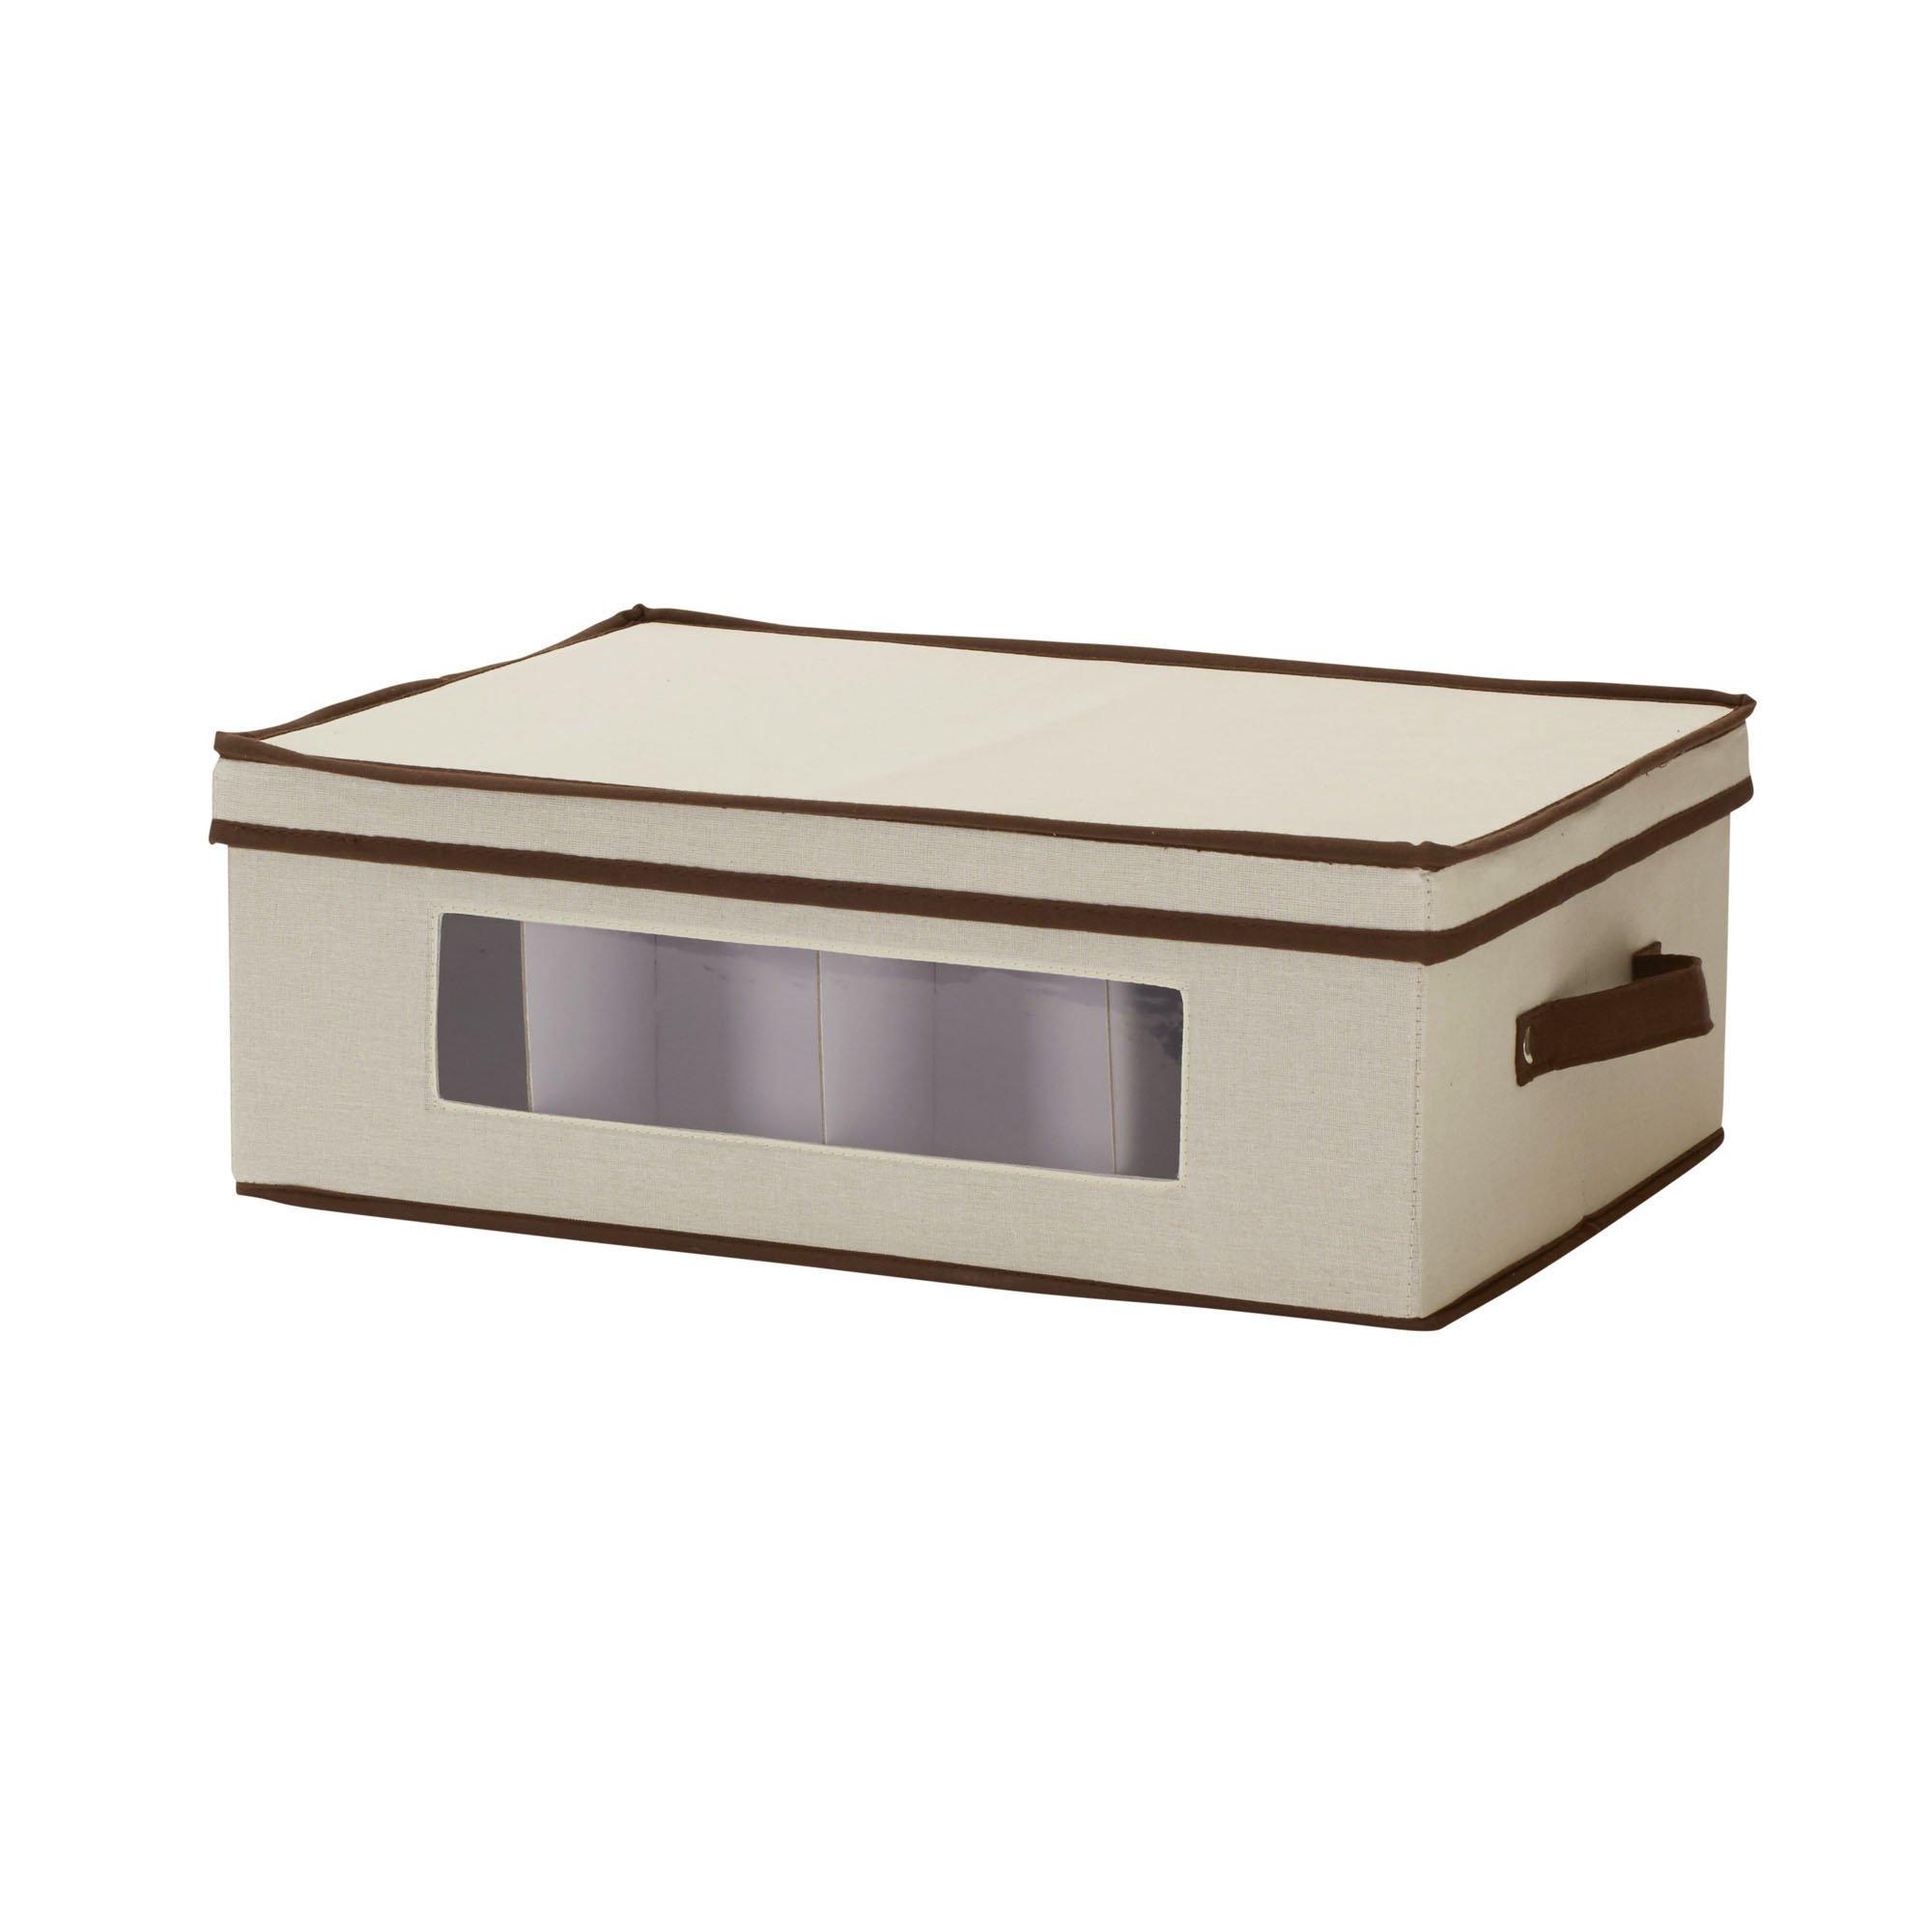 Household Essentials 531 Mug and Tumbler Vision China Storage Box Chest Natural